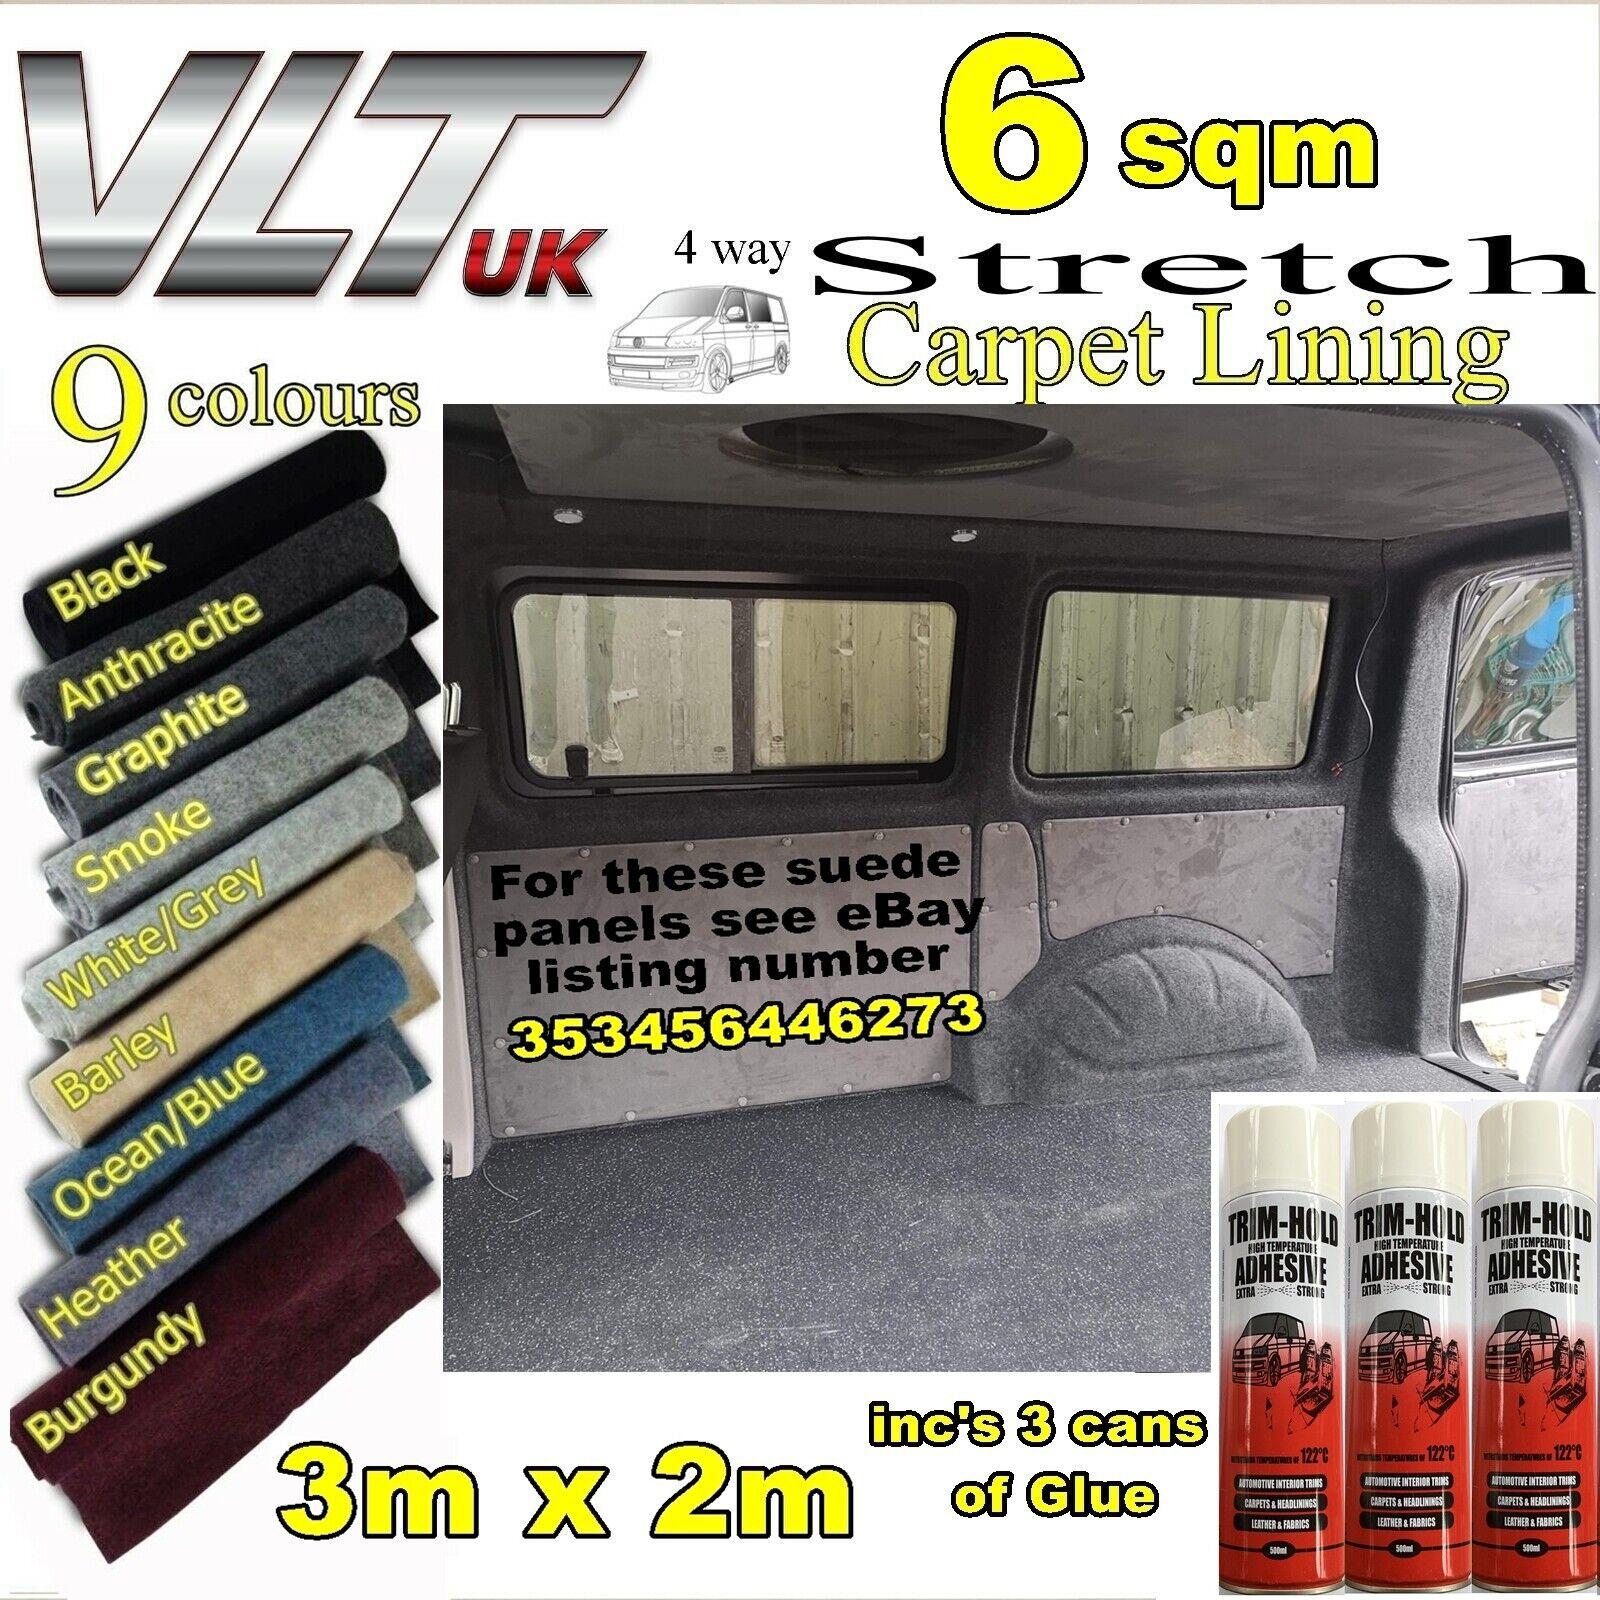 Car Parts - CAMPER VAN CAR CARPET LINING 4 way stretch VW T 6 5 1 TRIM TRANSIT RACE DAY 6sqm